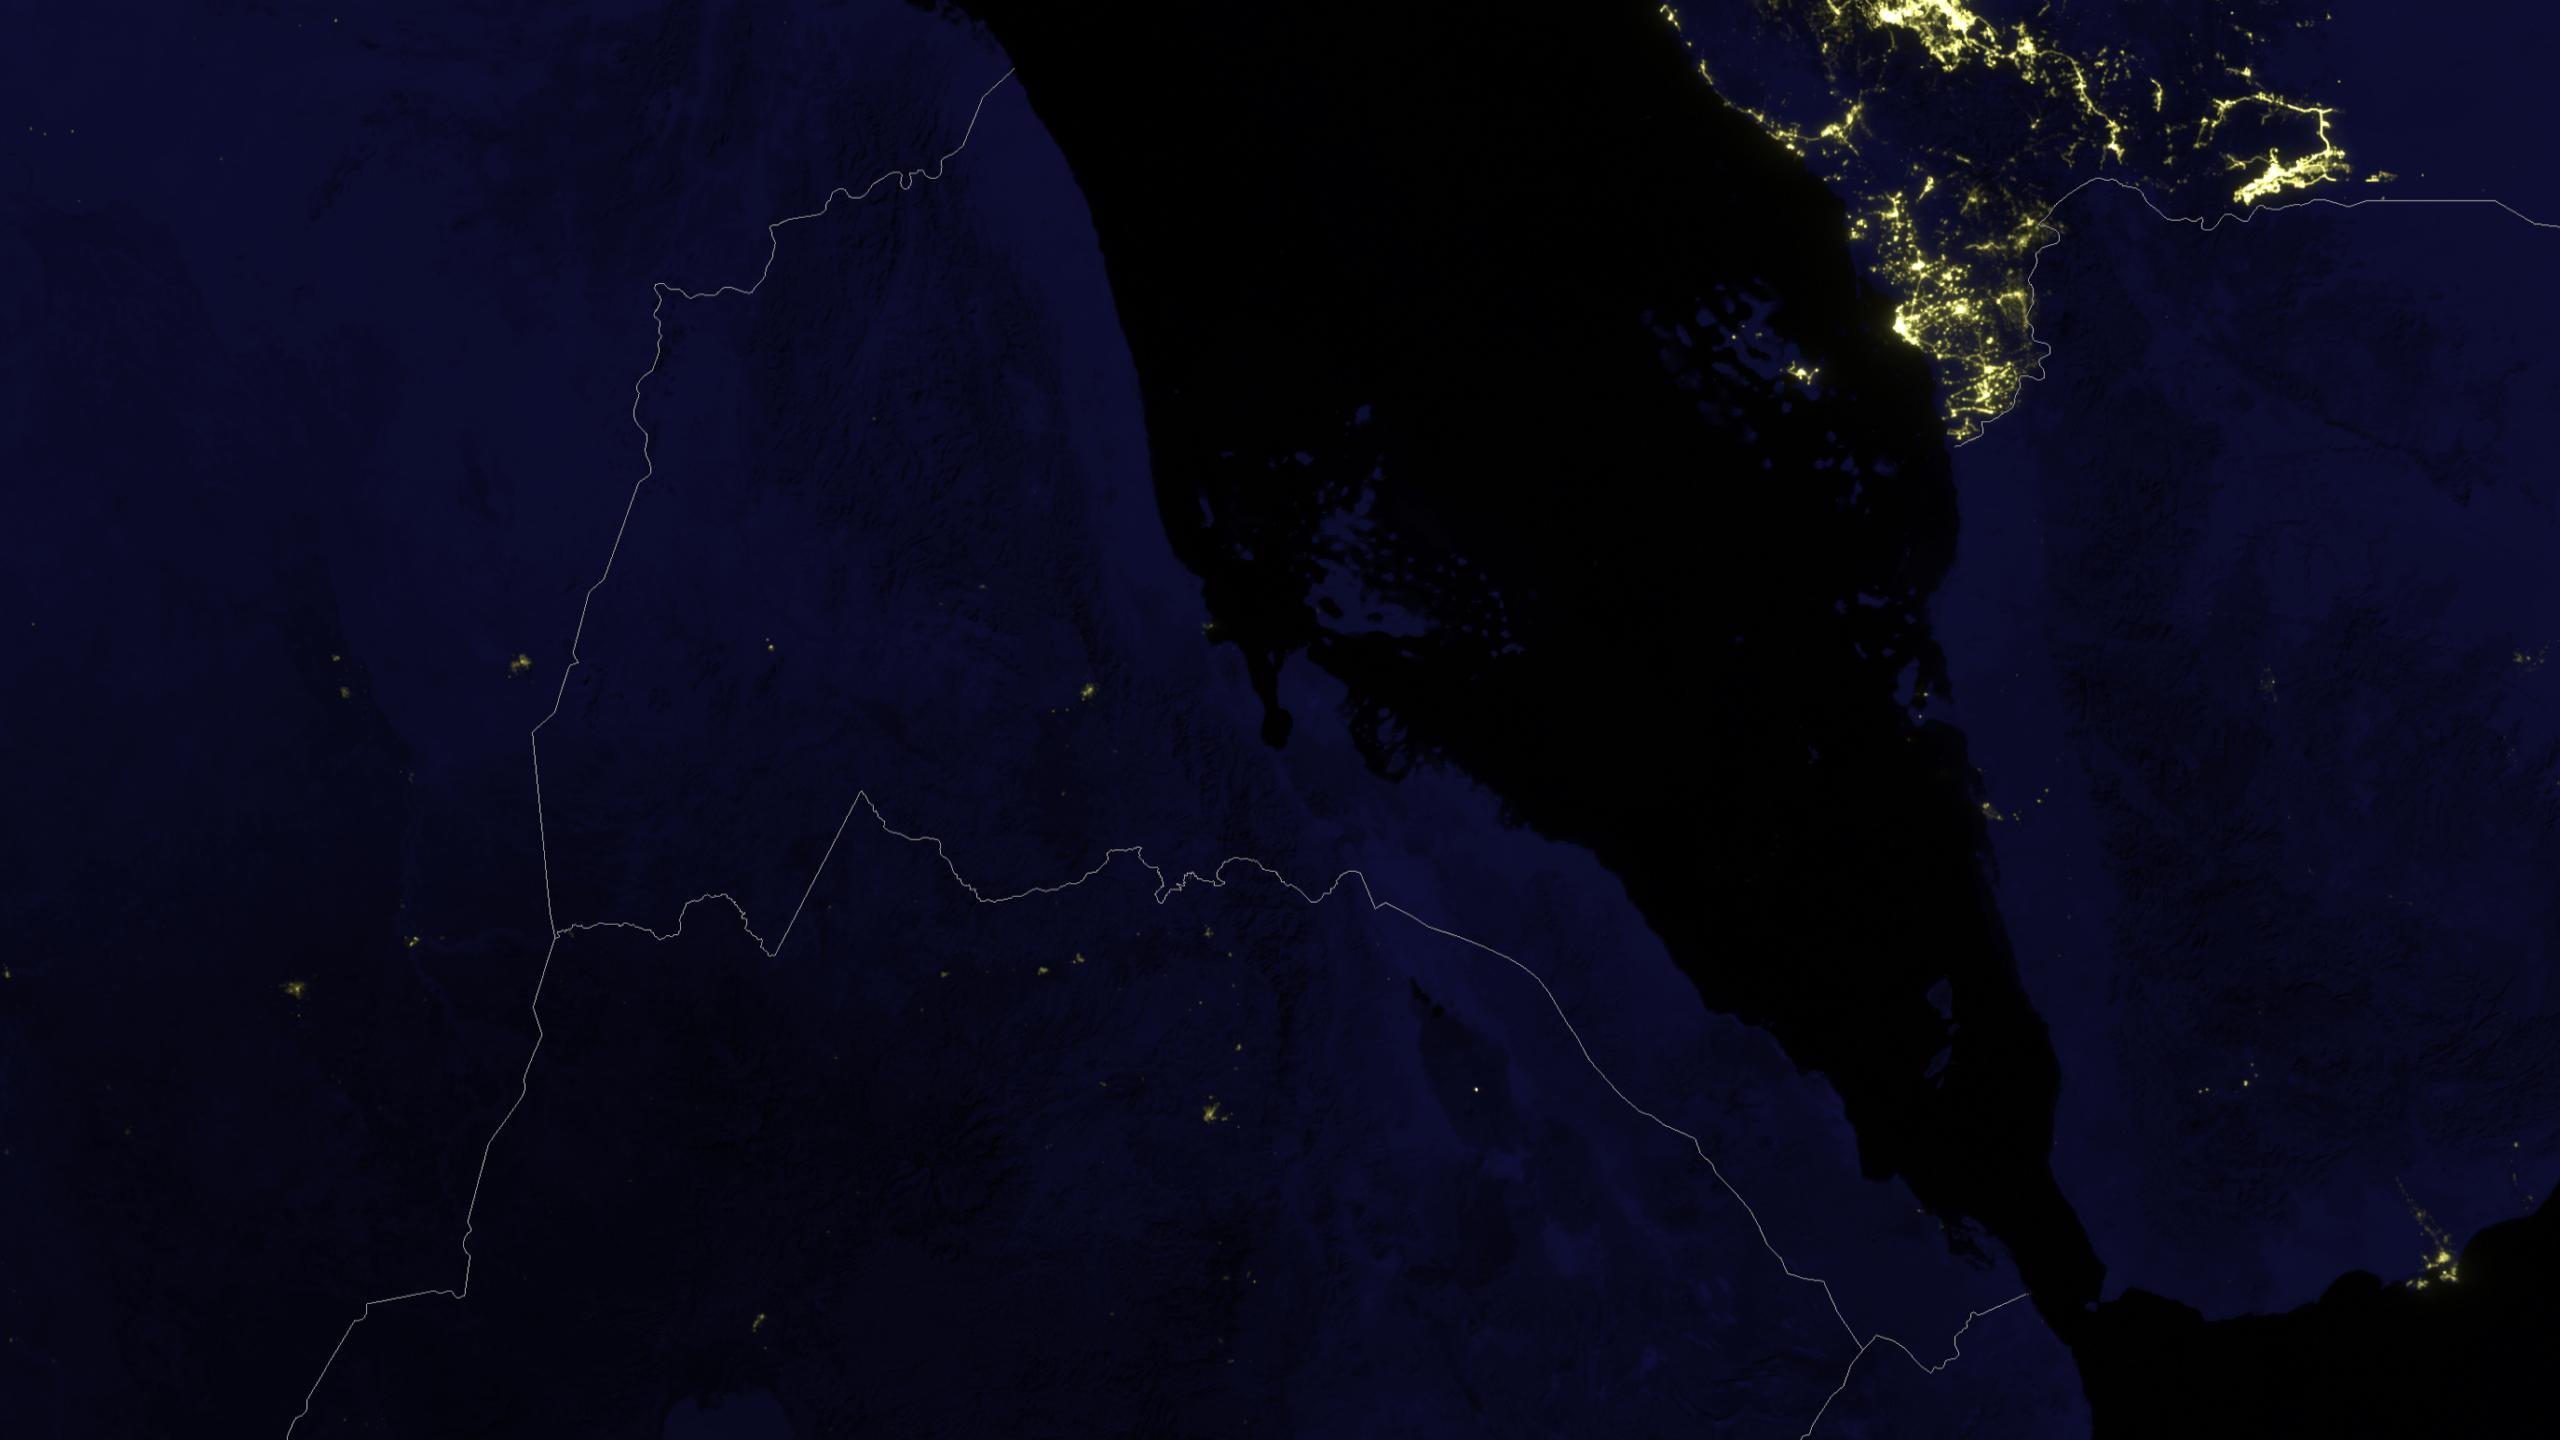 Blue Marble Navigator Night Lights Wallpaper Images